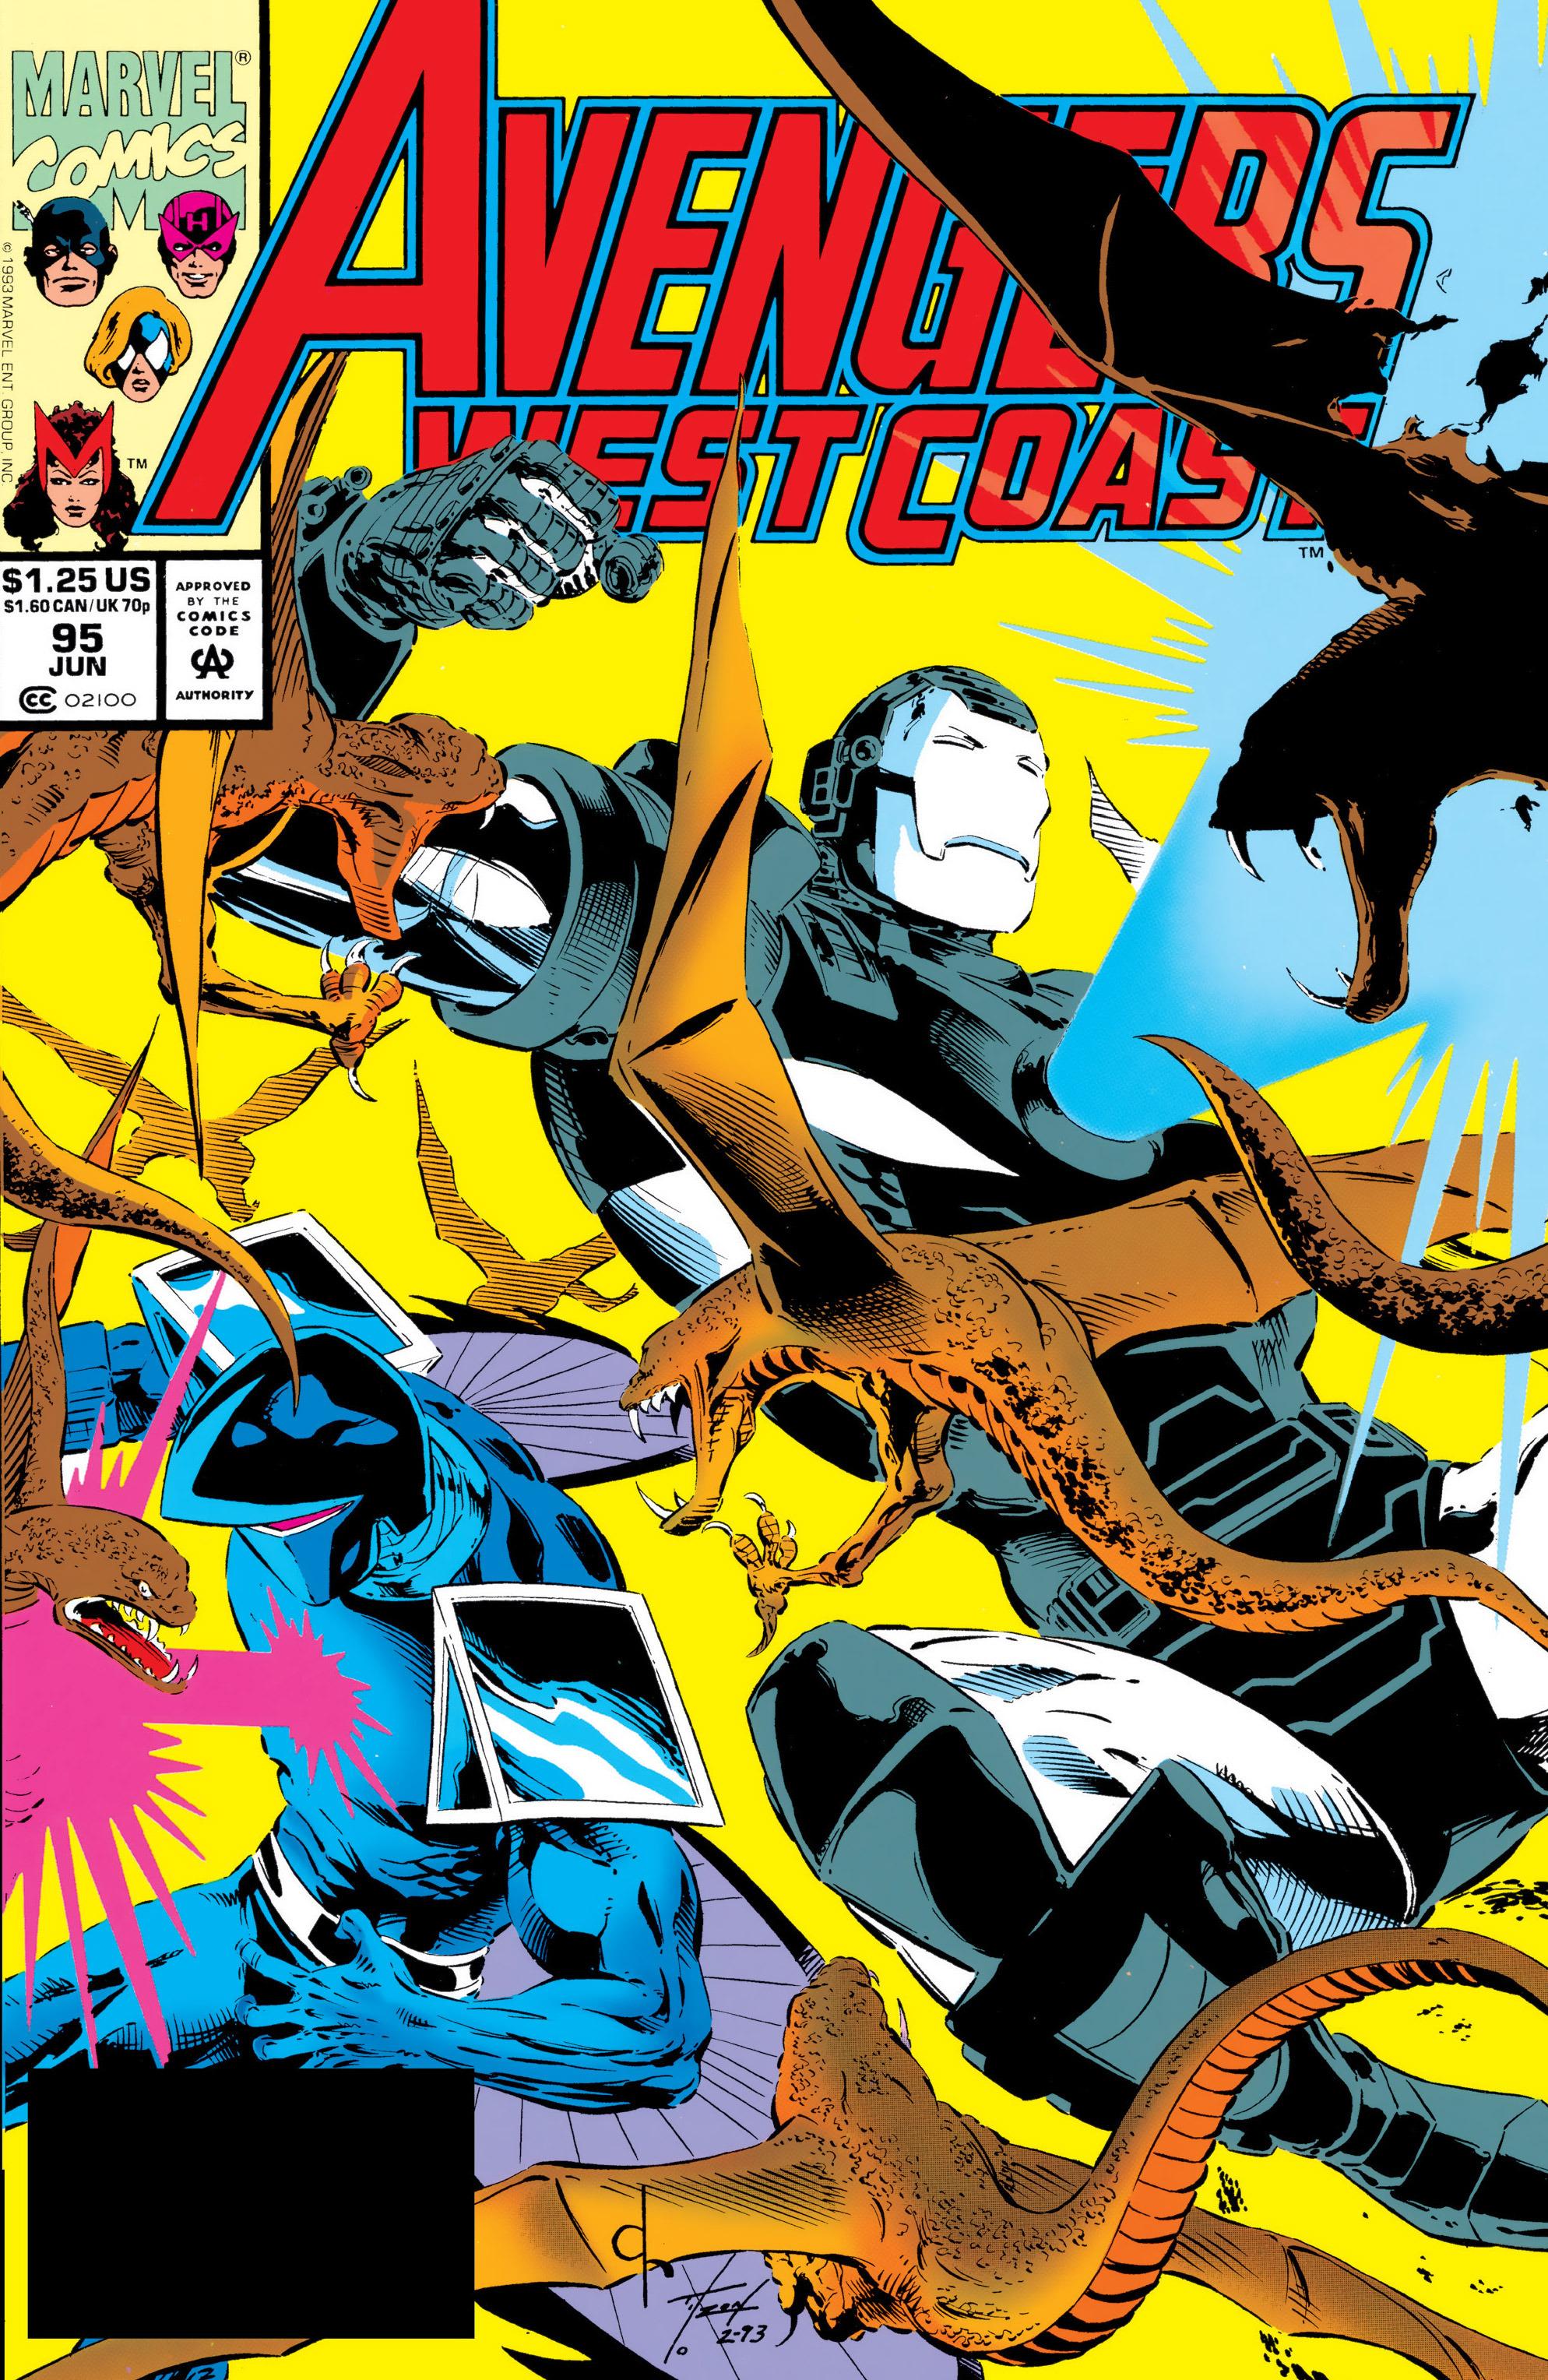 Avengers West Coast (1989) 95 Page 1